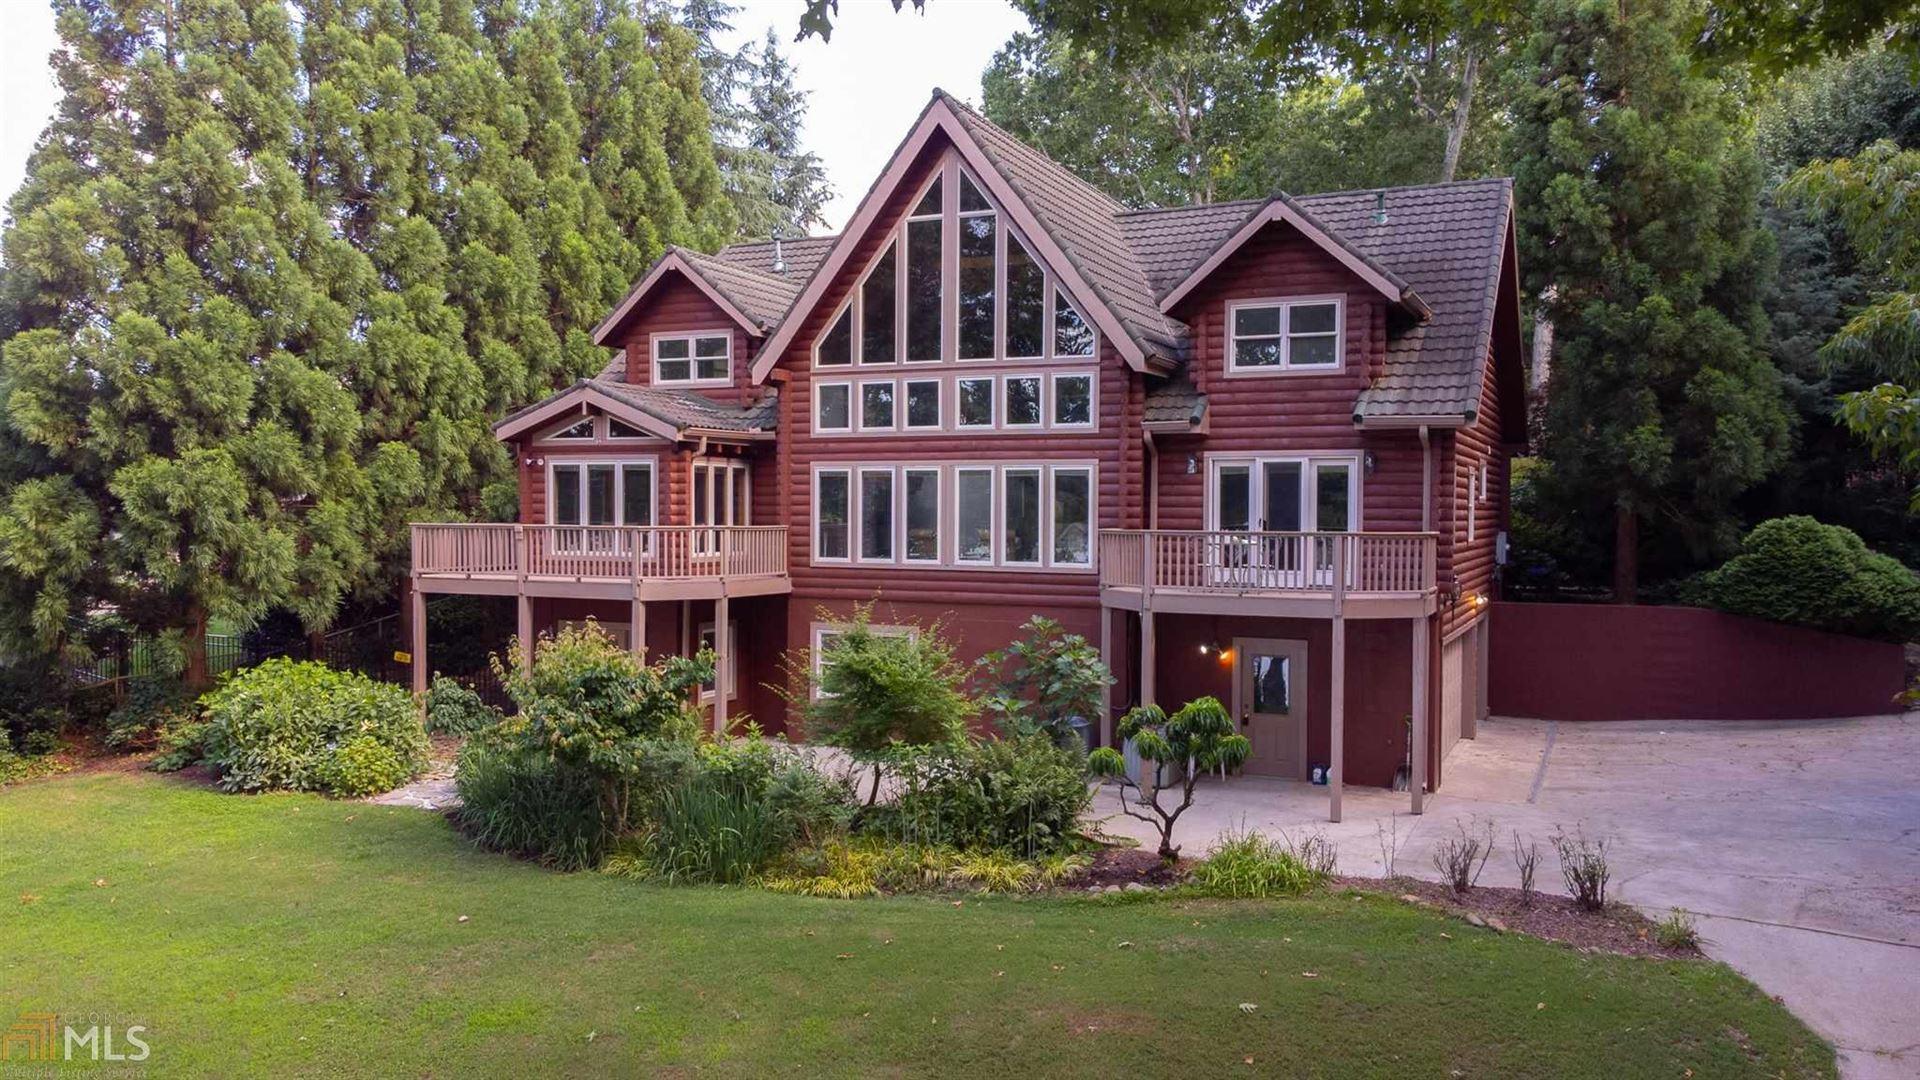 6205 Lake Lanier Heights Rd, Buford, GA 30518 - #: 8881325